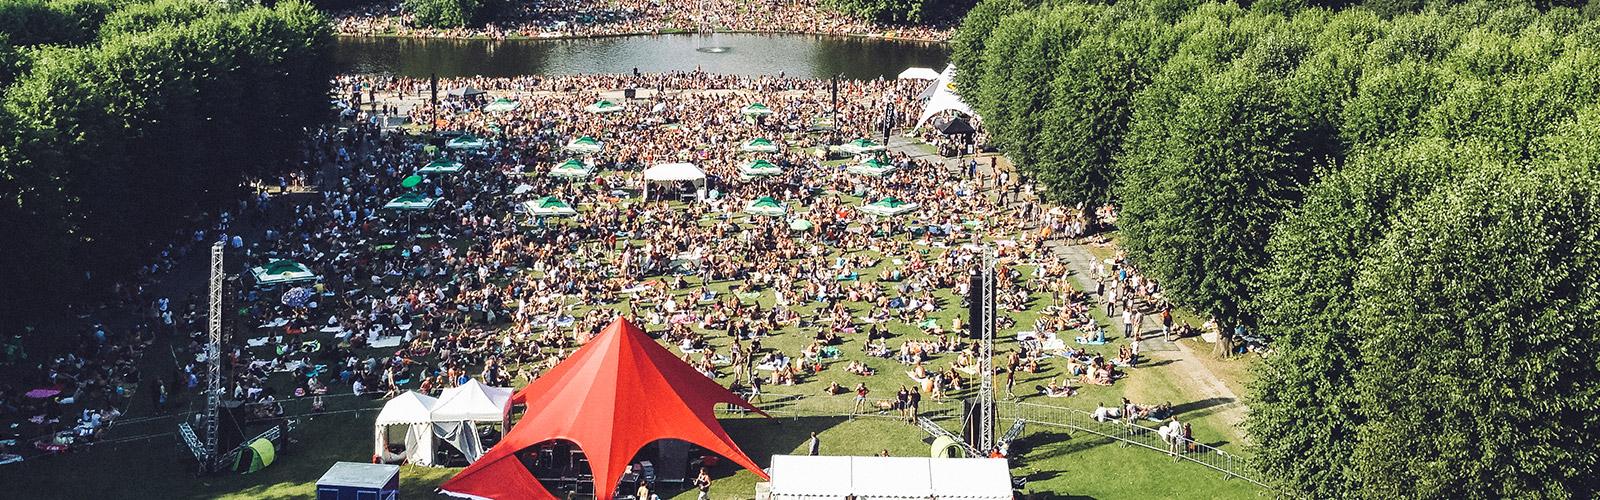 Stella Polaris i Frederiksberghave en sommerdag i august